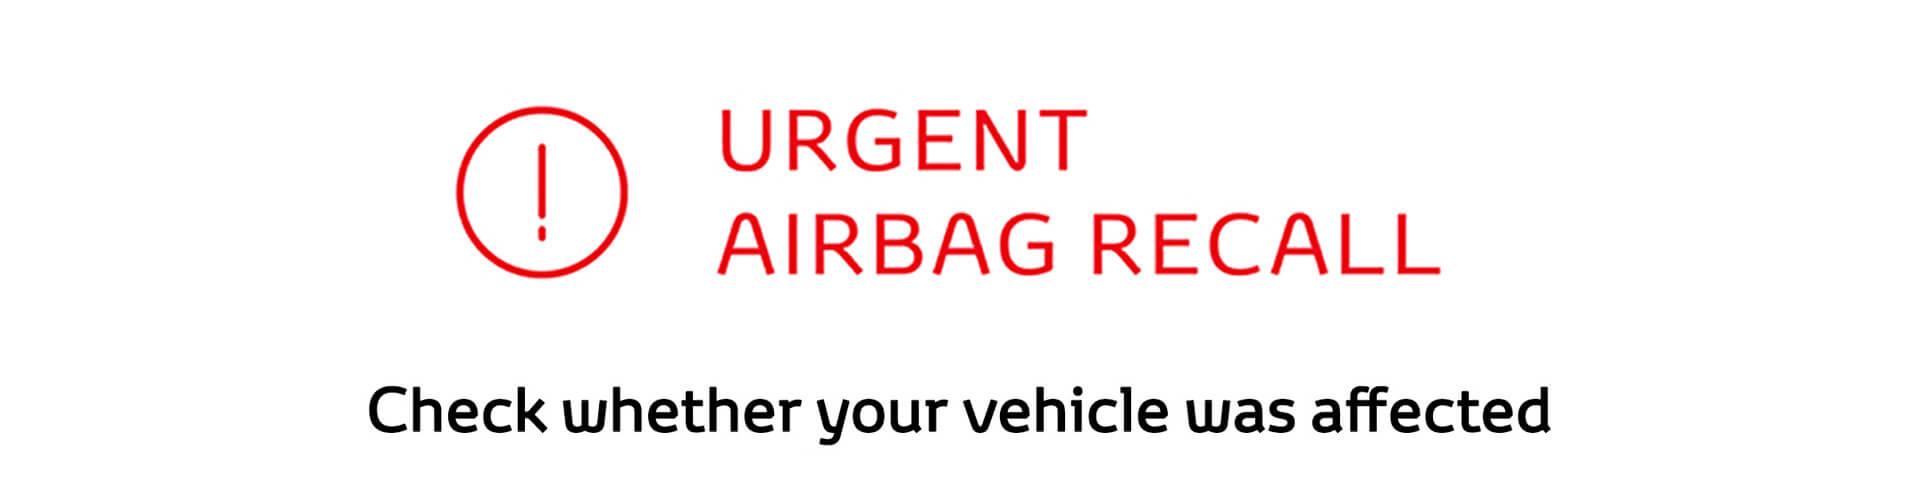 Urgent Airbag Recall